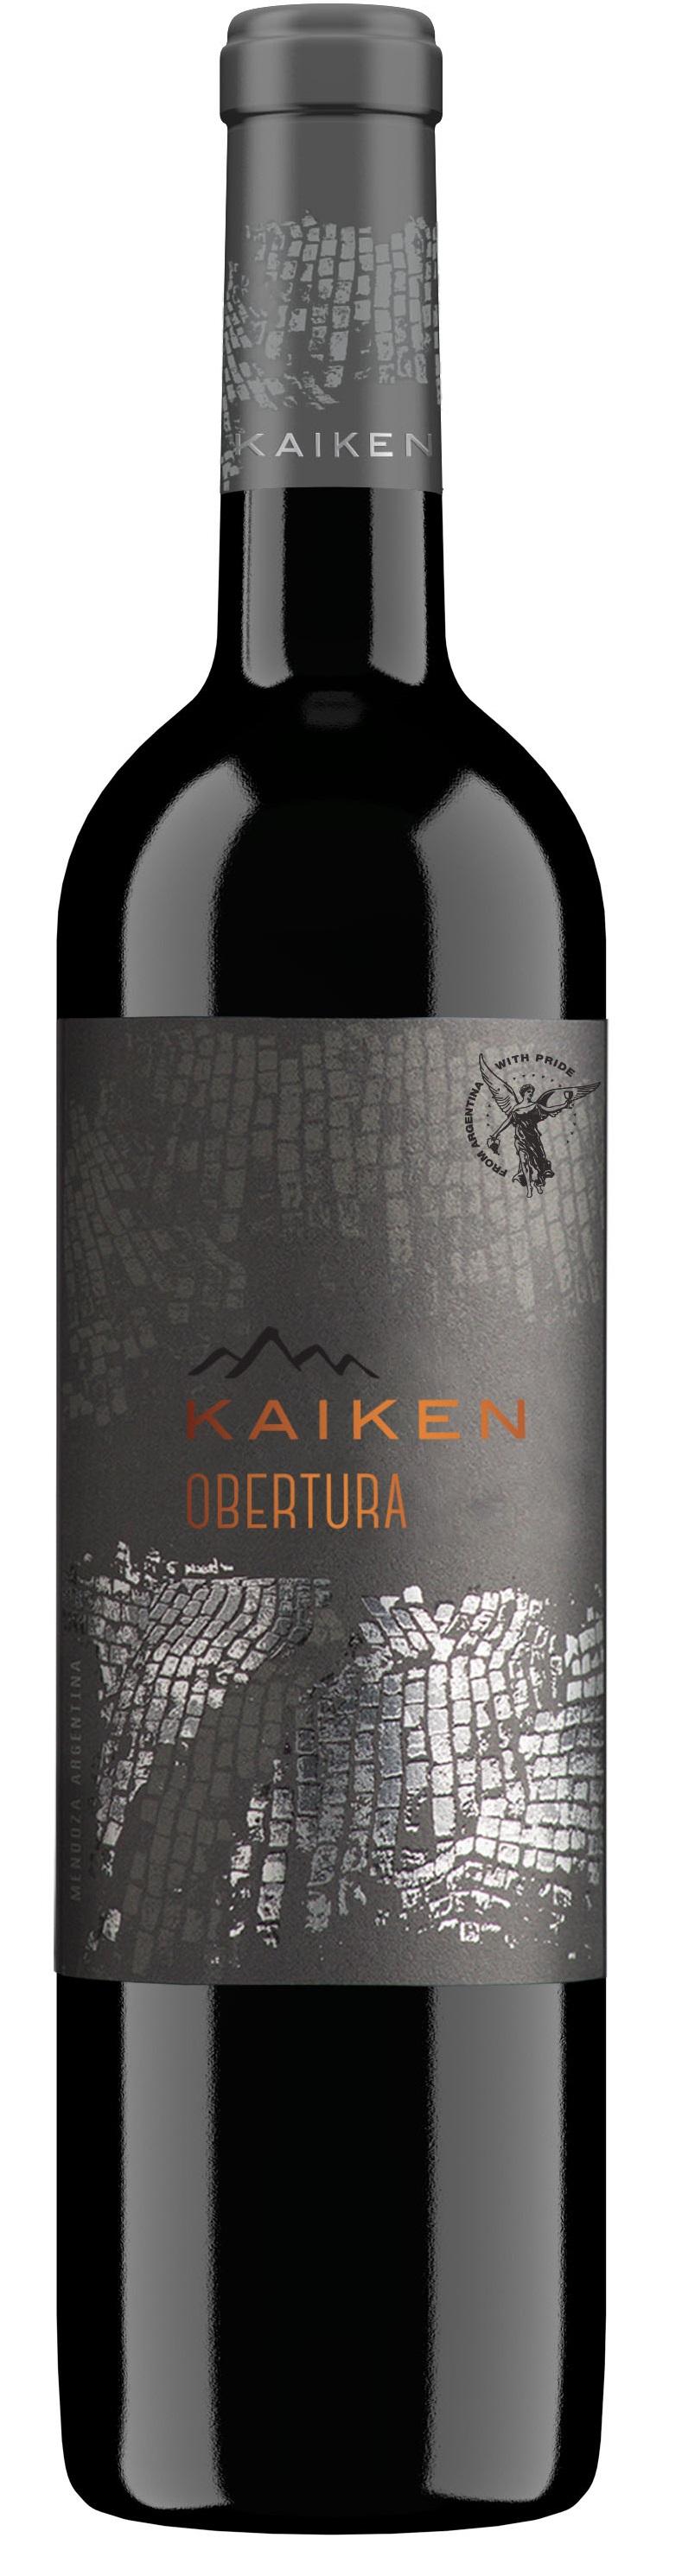 Kaiken, Obertura Uco Valley Cabernet Franc 2014